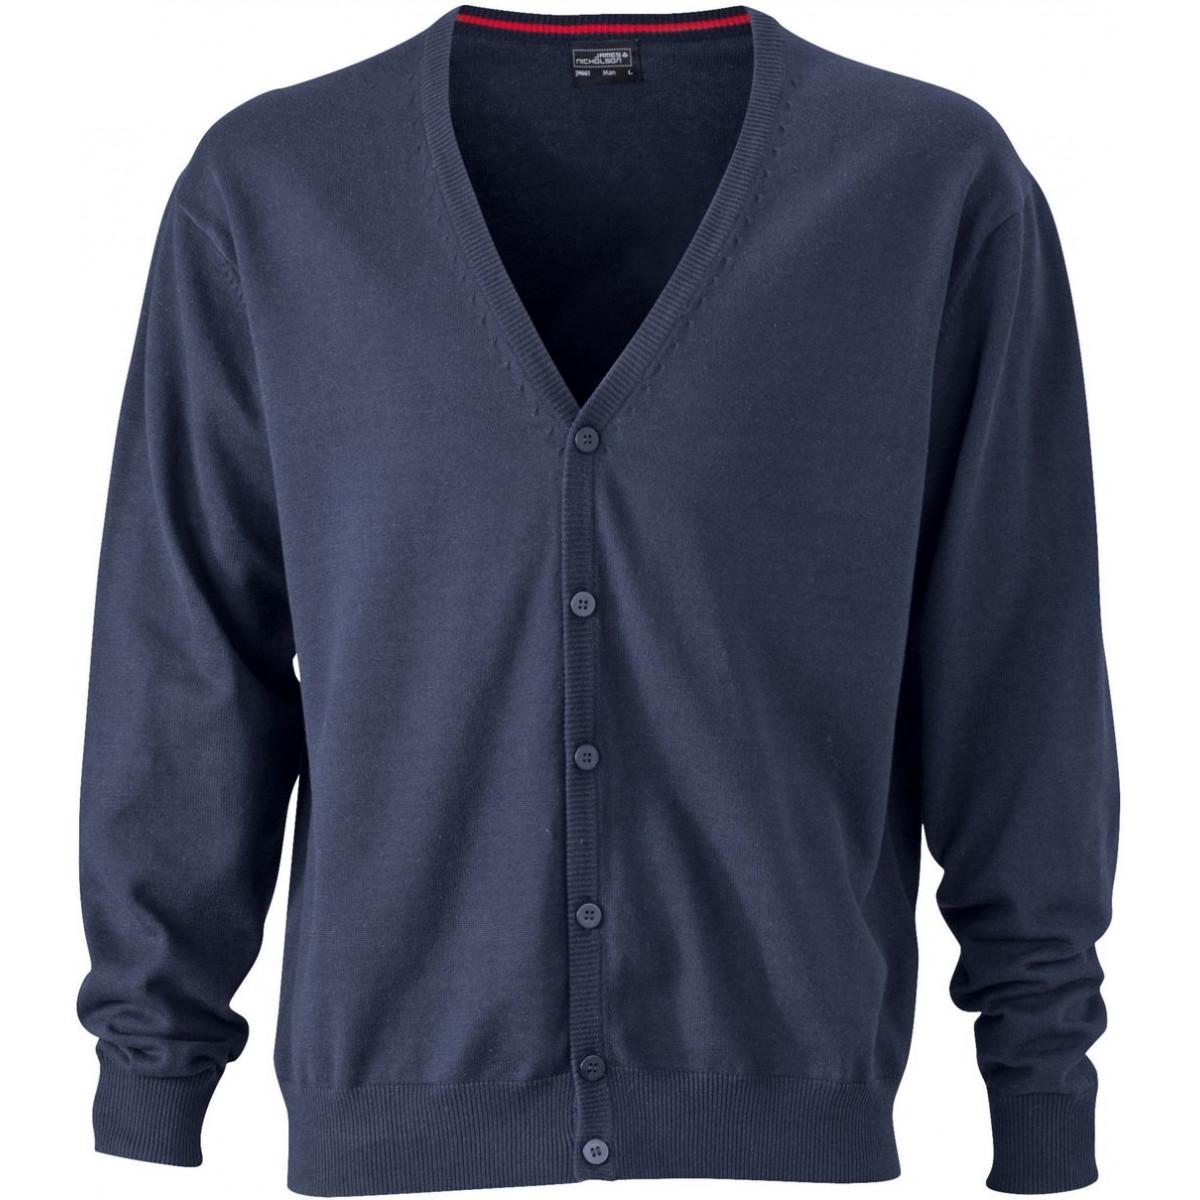 Кардиган мужской JN661 Mens V-Neck Cardigan - Темно-синий